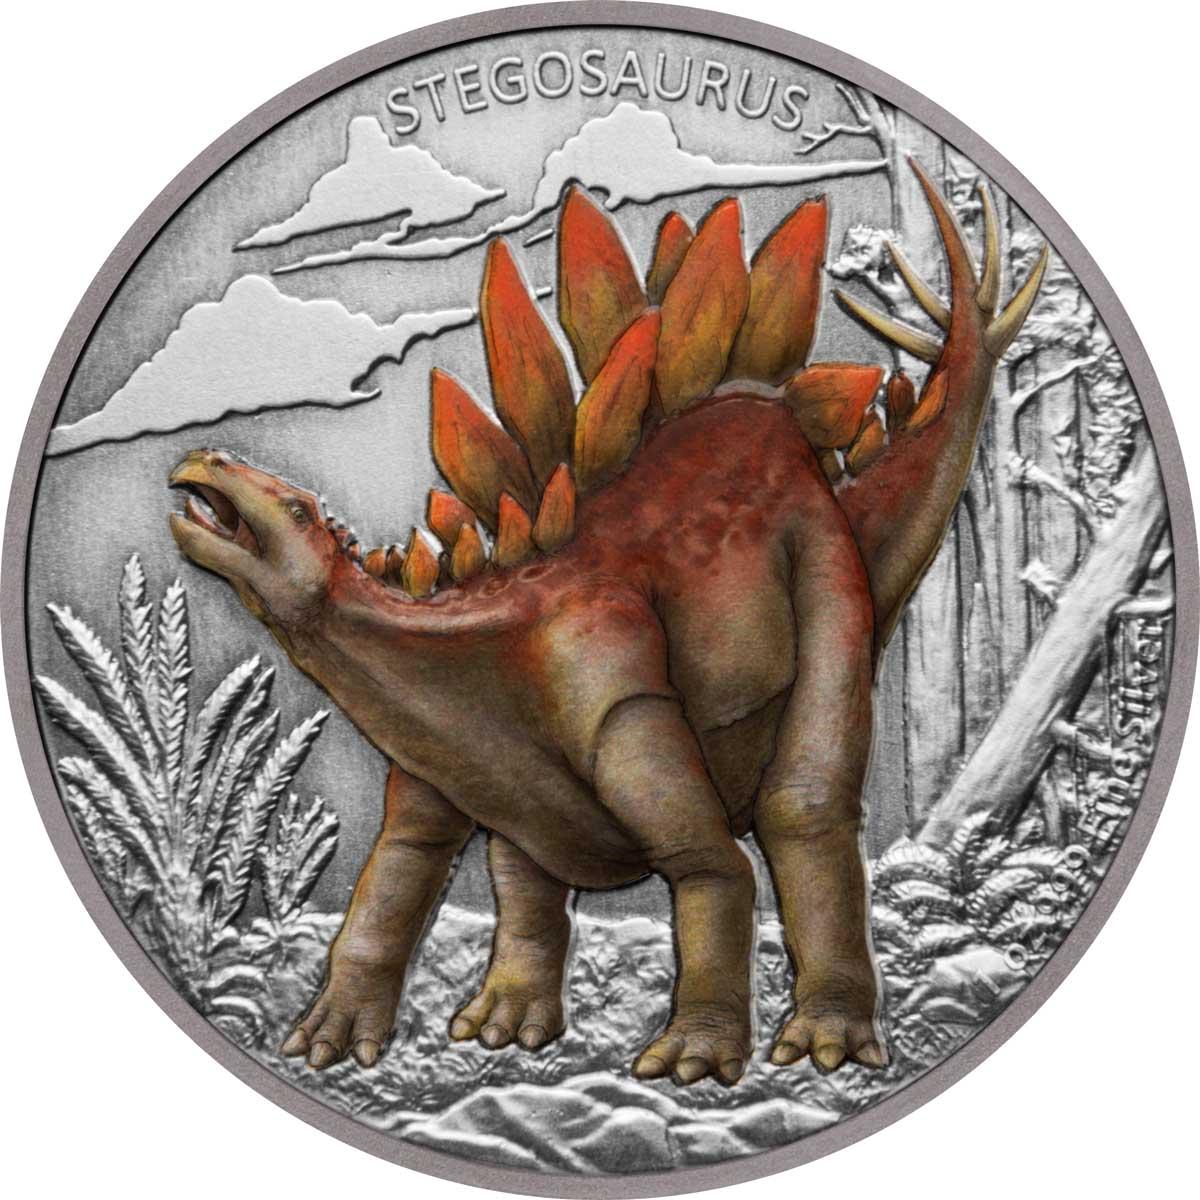 Ниуэ монета 2 доллара Стегозавр, реверс